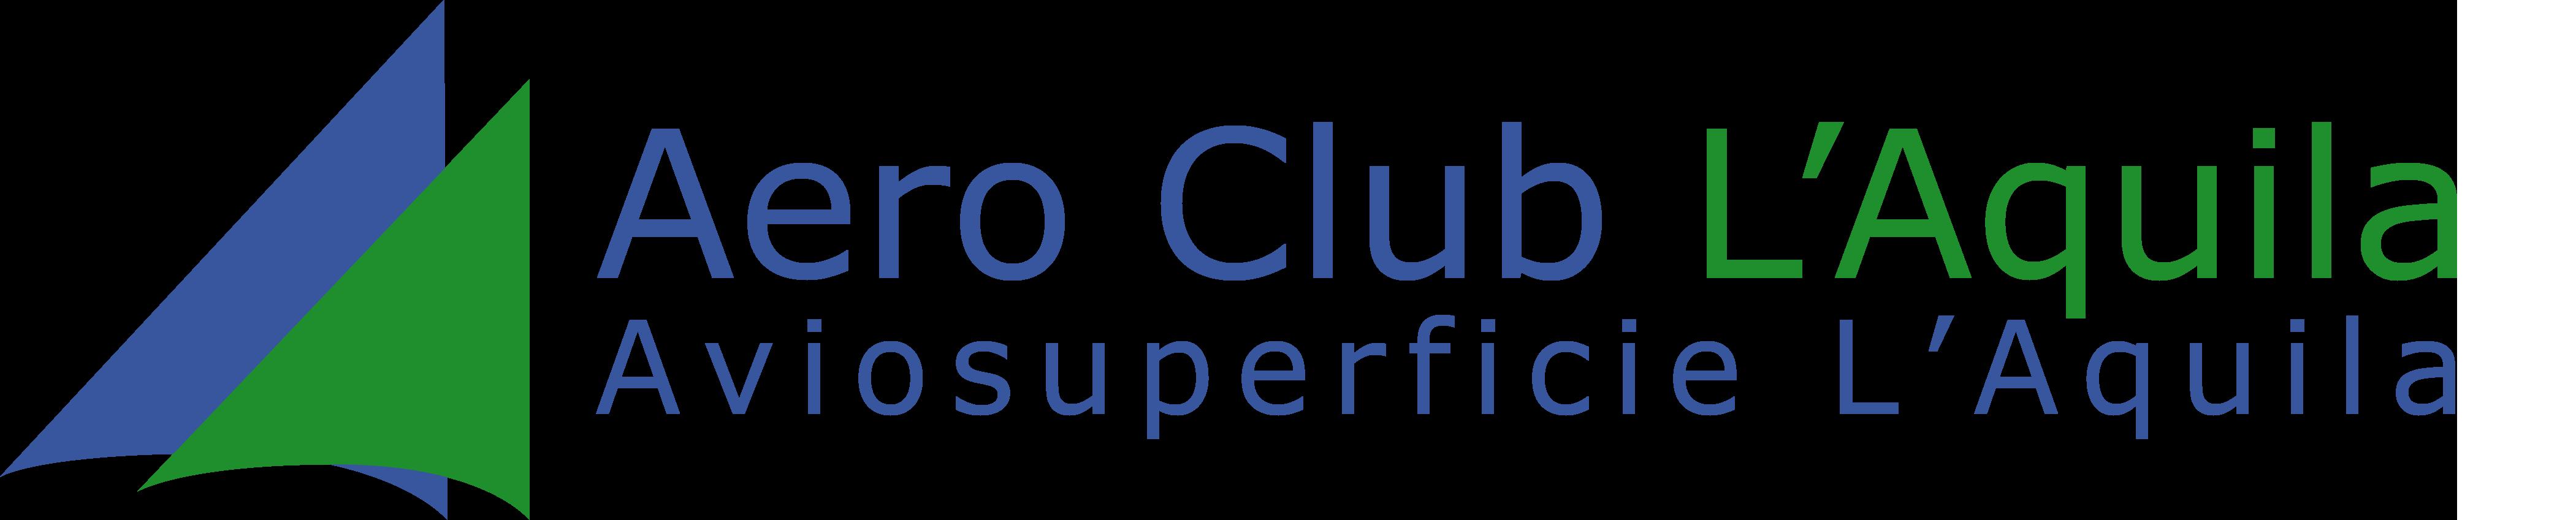 Logo nuovo Aero Club L'Aquila